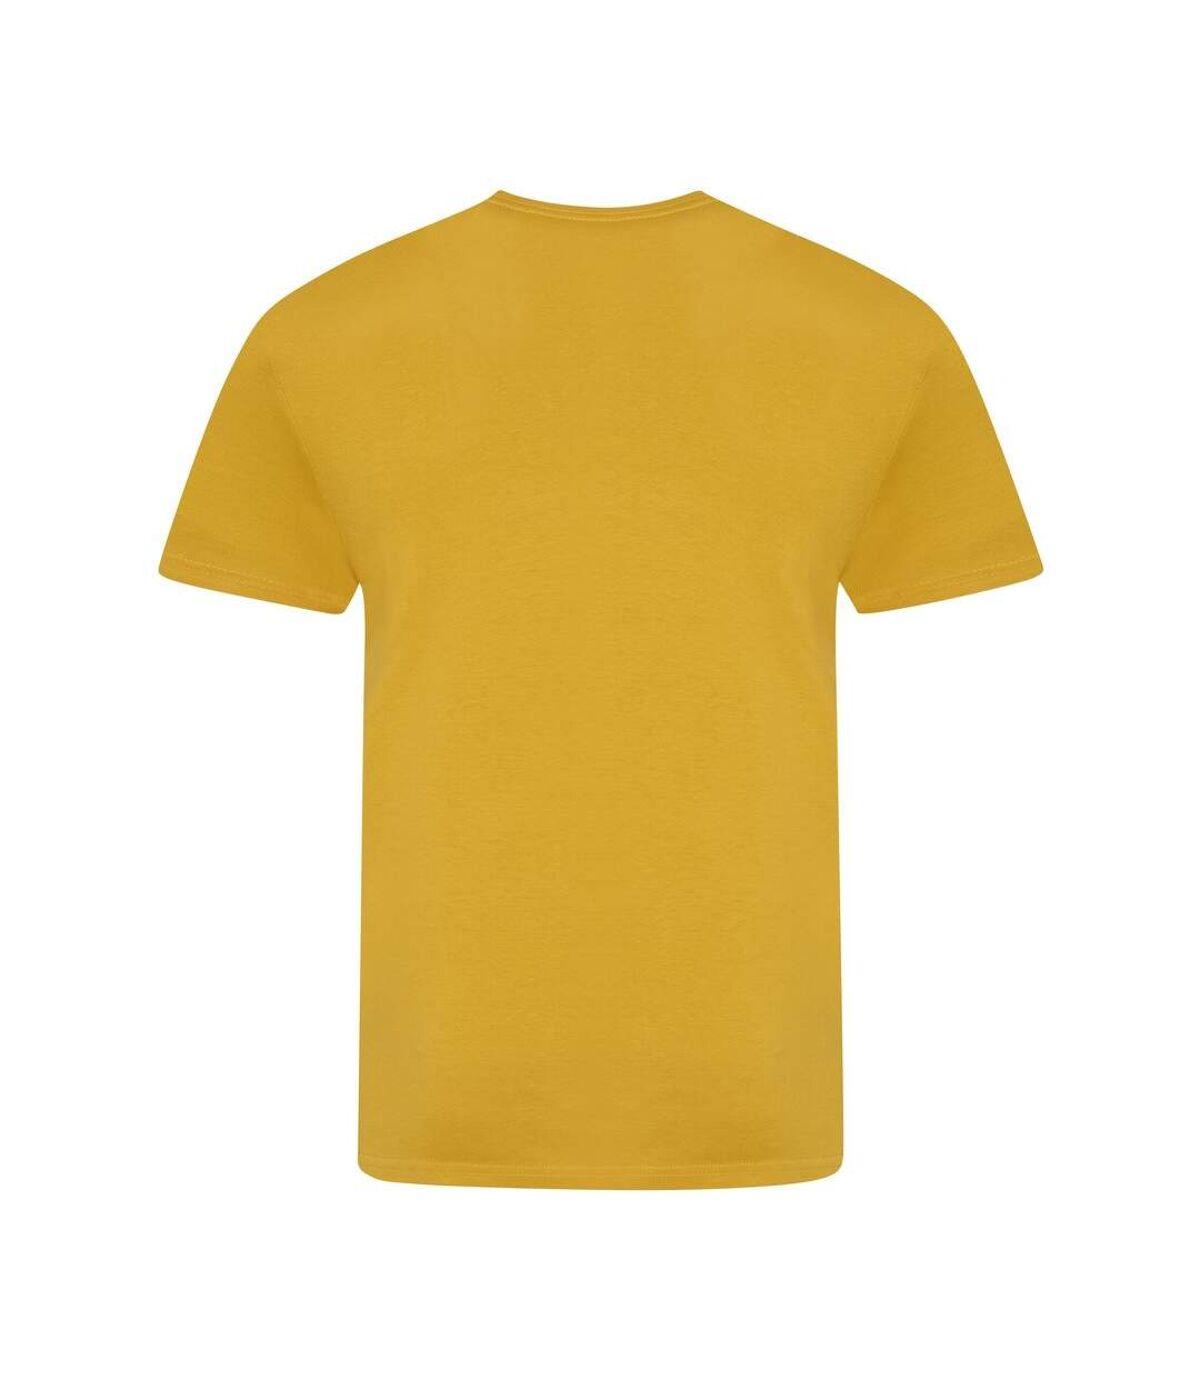 AWDis Just Ts Mens The 100 T-Shirt (Mustard) - UTPC4081